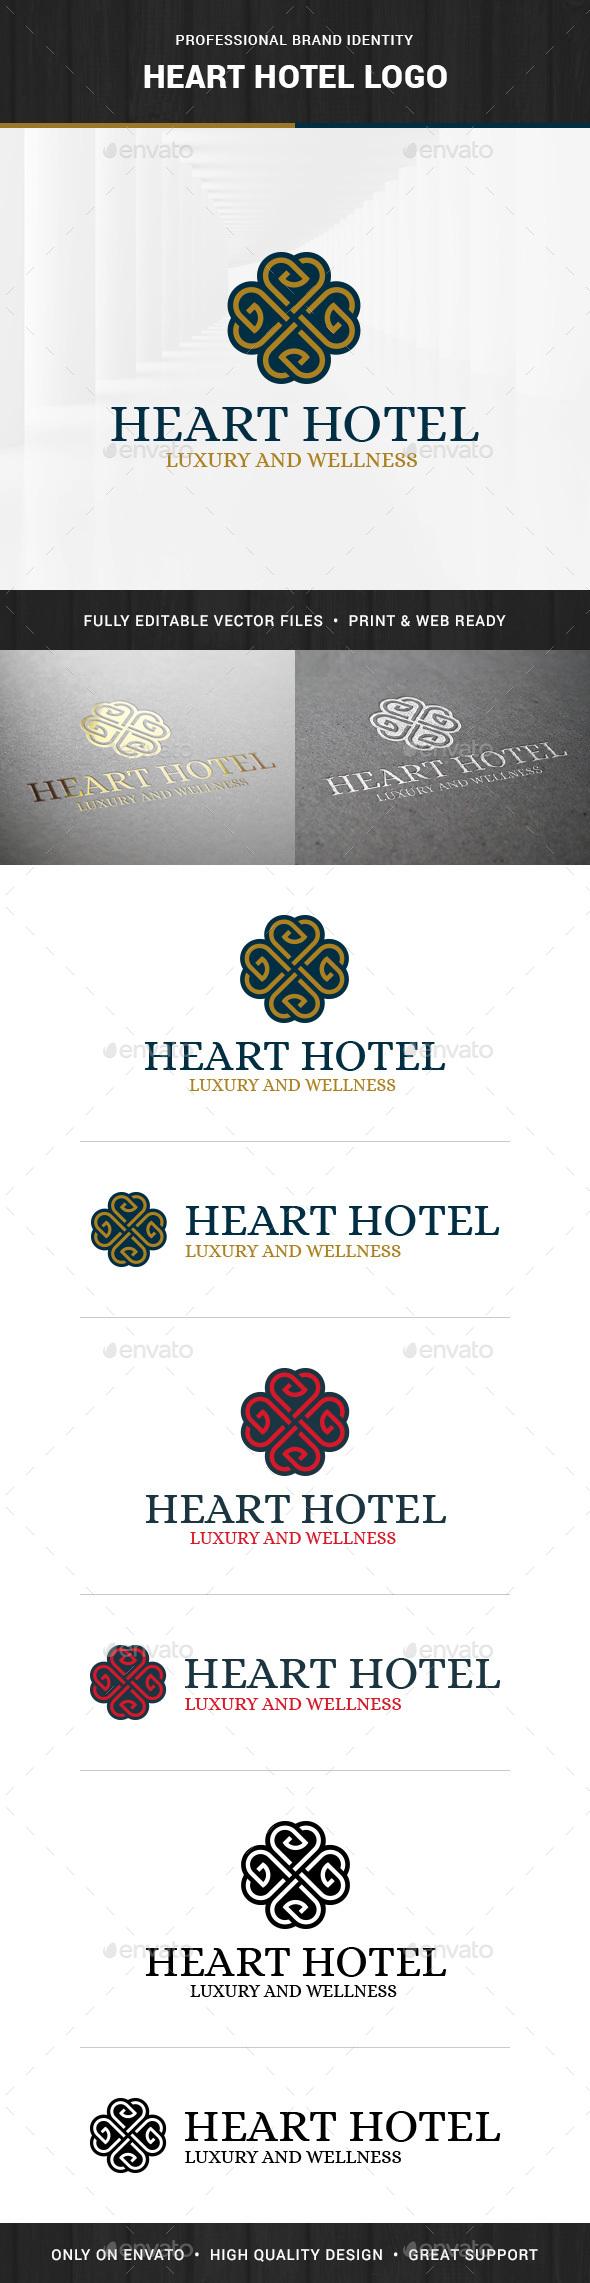 Heart Hotel Logo Template - Symbols Logo Templates